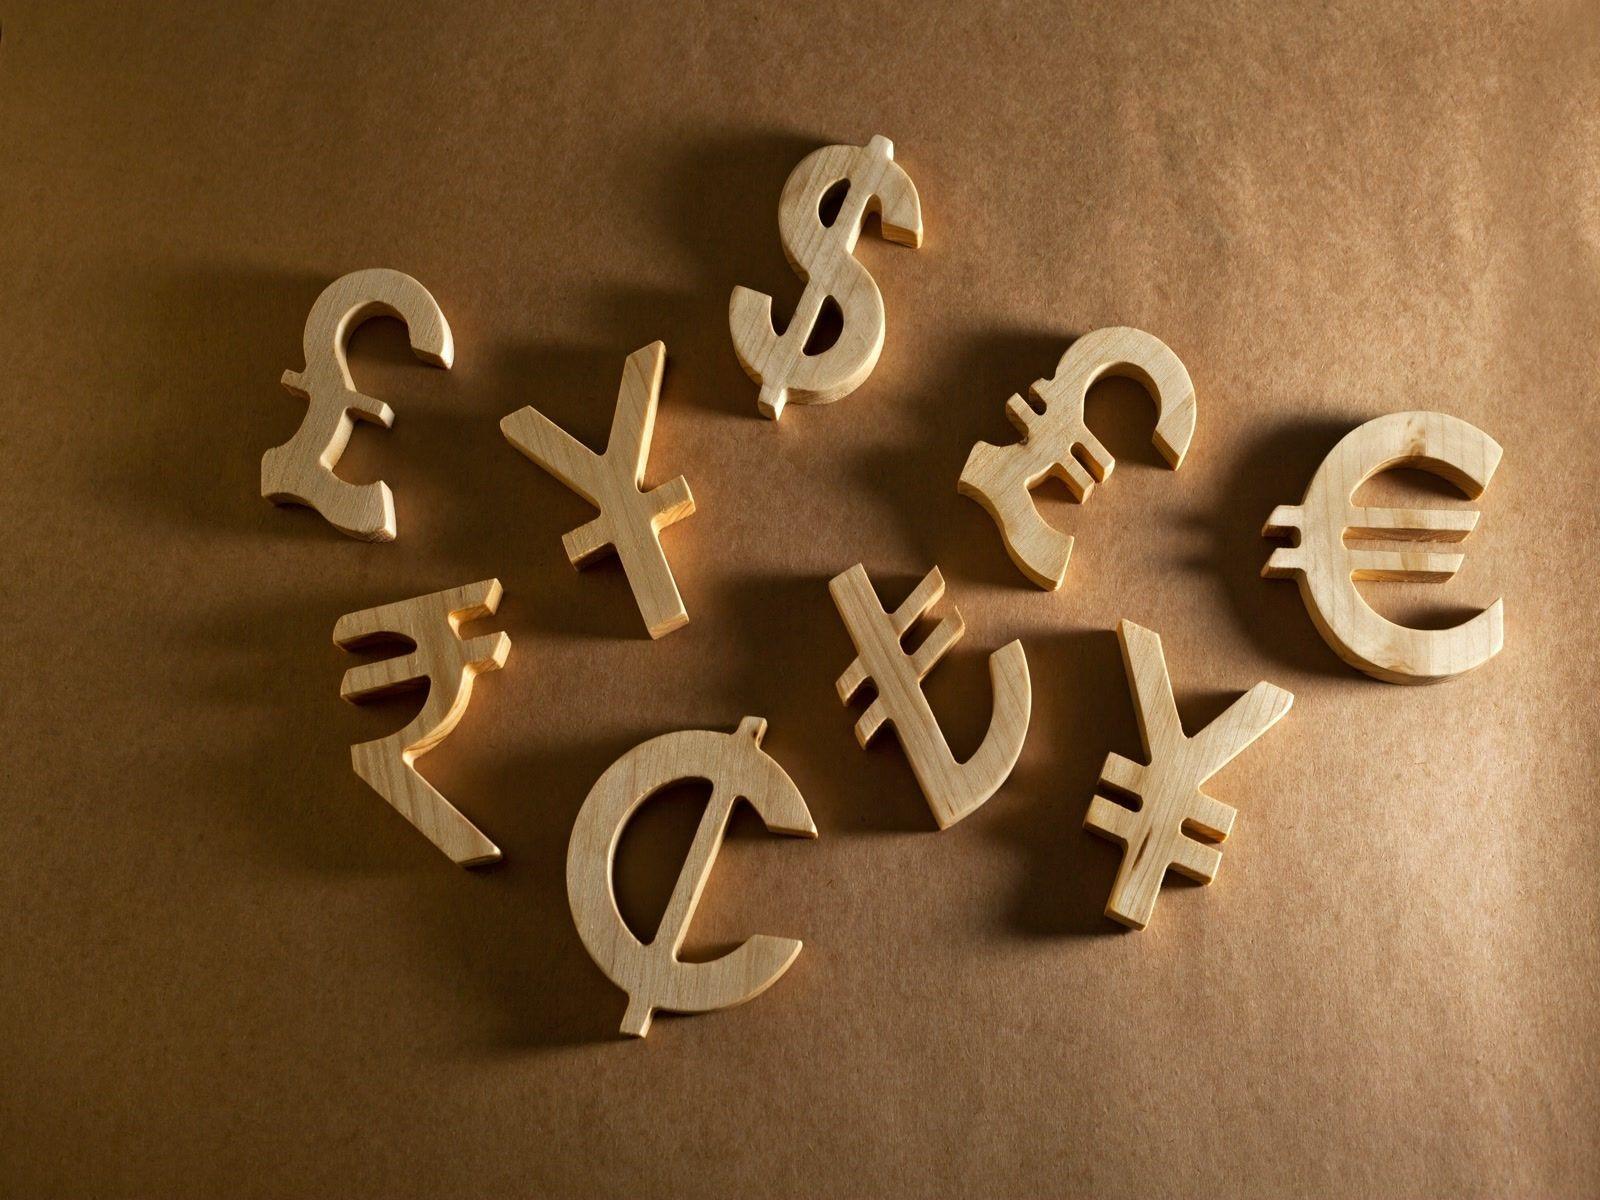 curs valutar azi cumparare